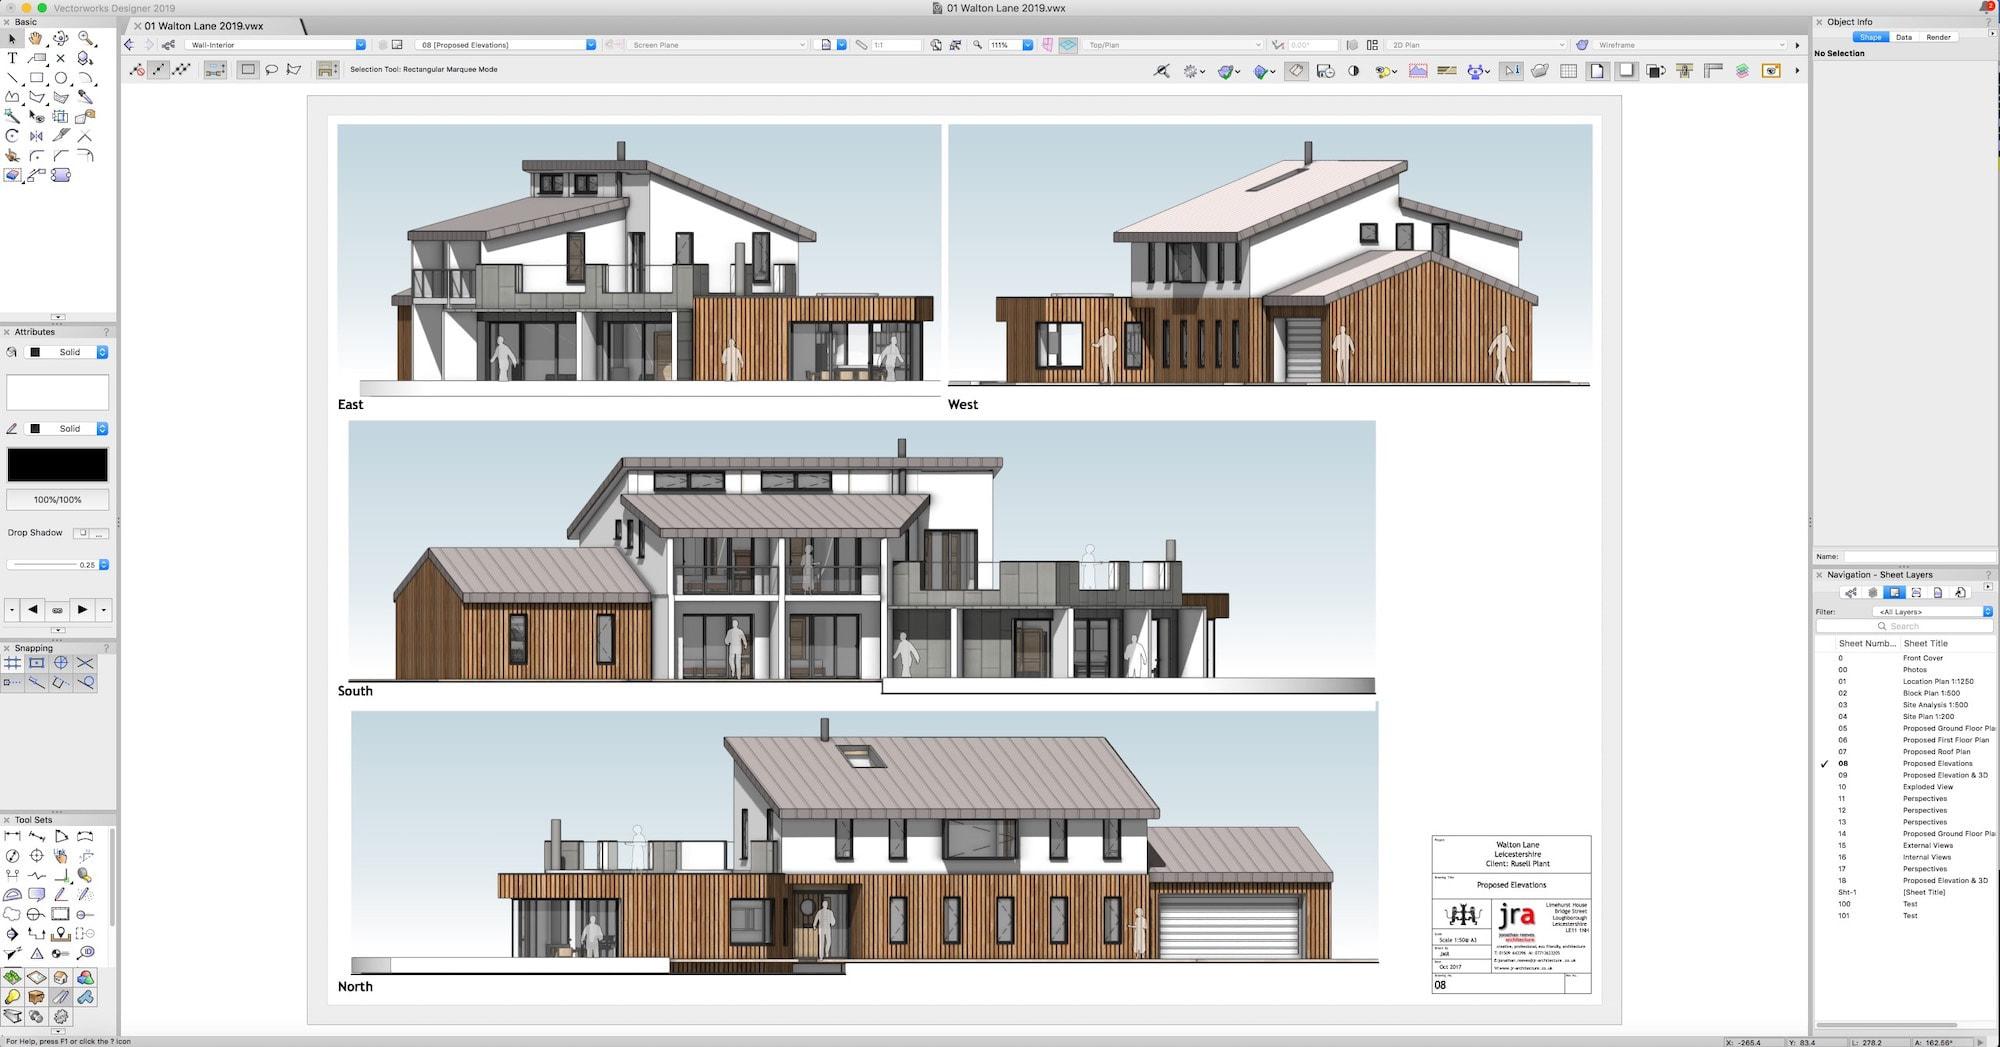 SaintFG - Vectorworks CAD Construction Software